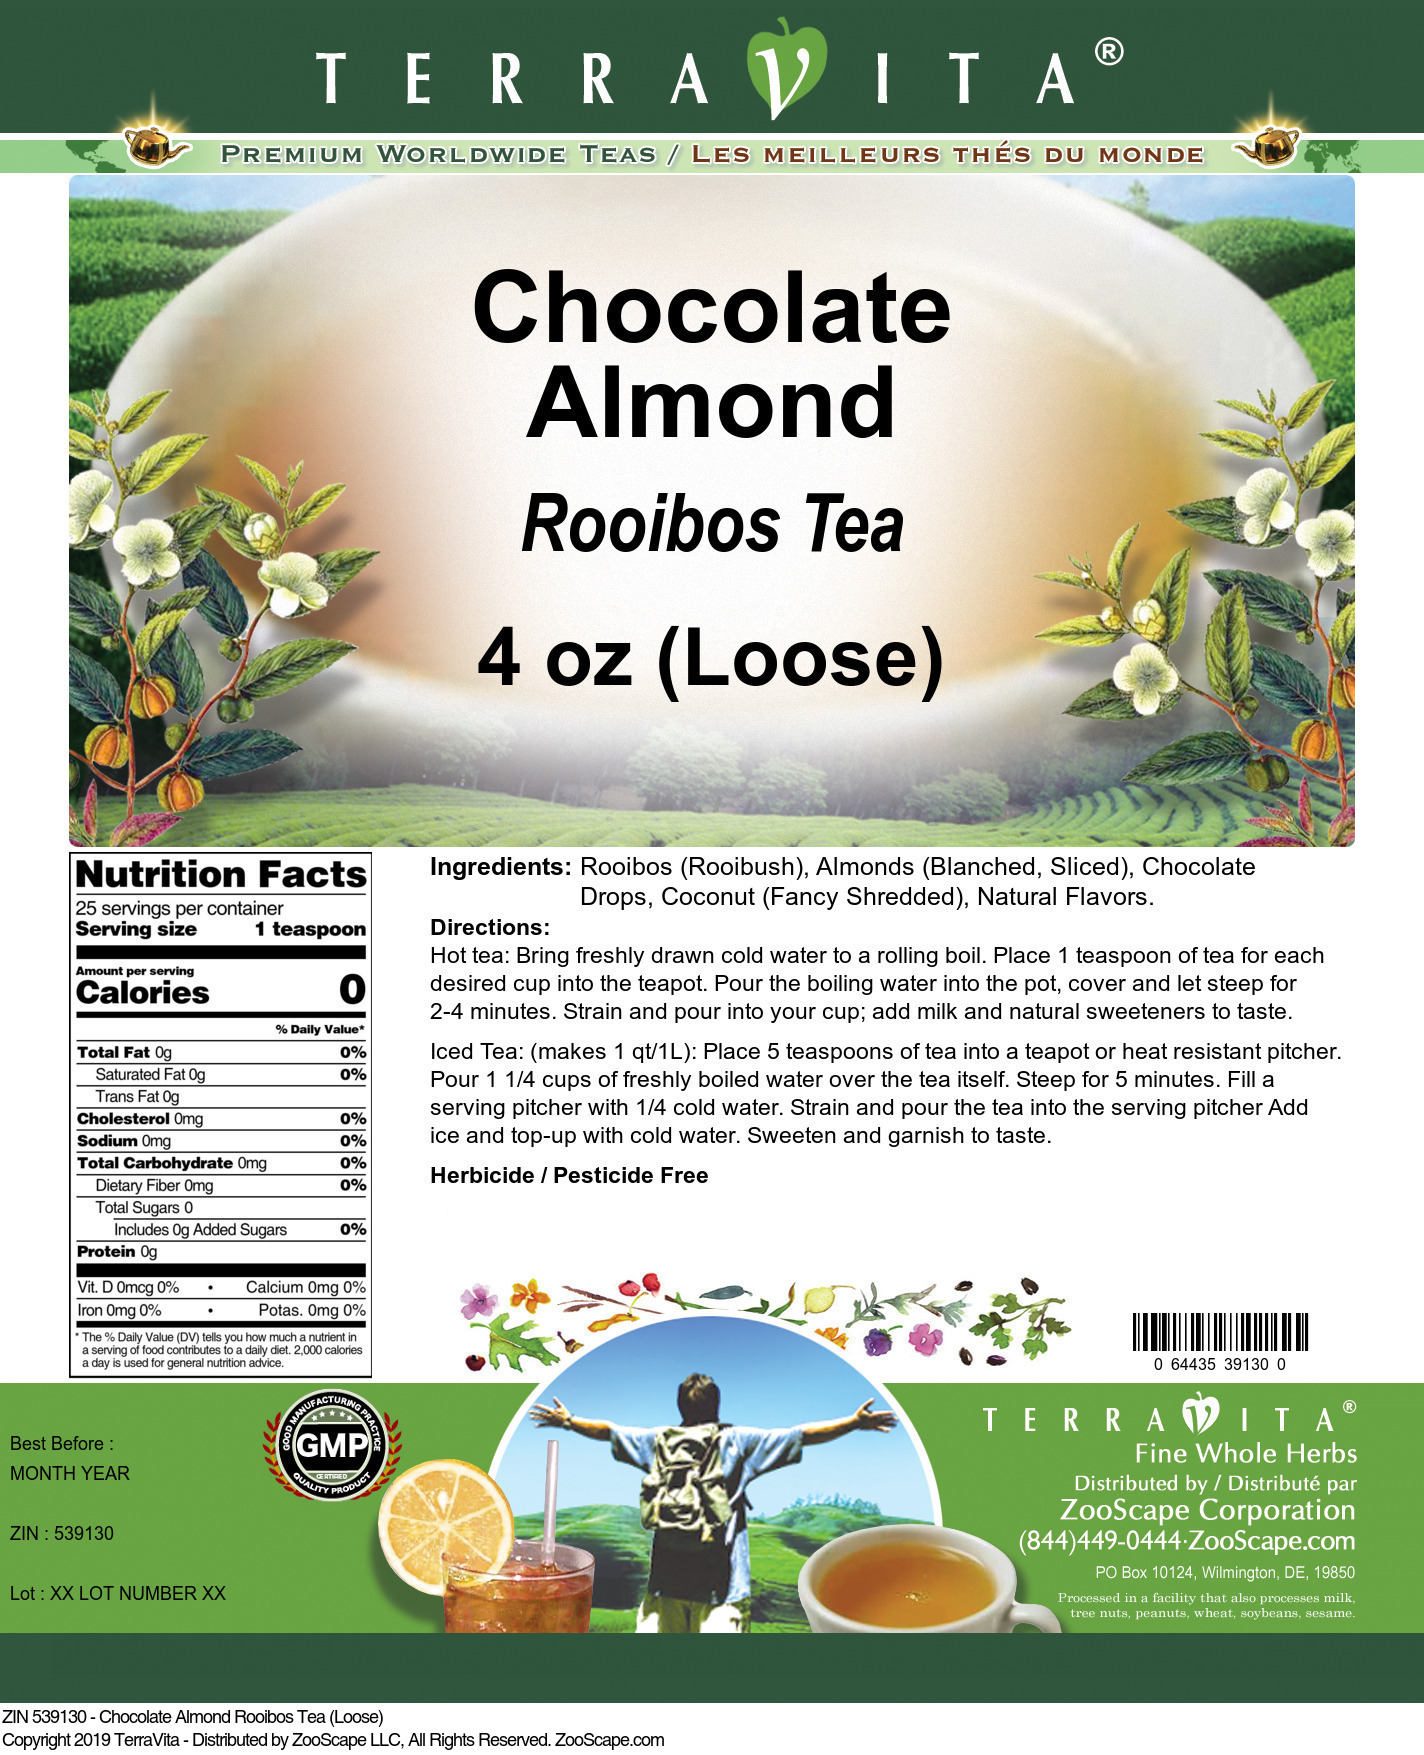 Chocolate Almond Rooibos Tea